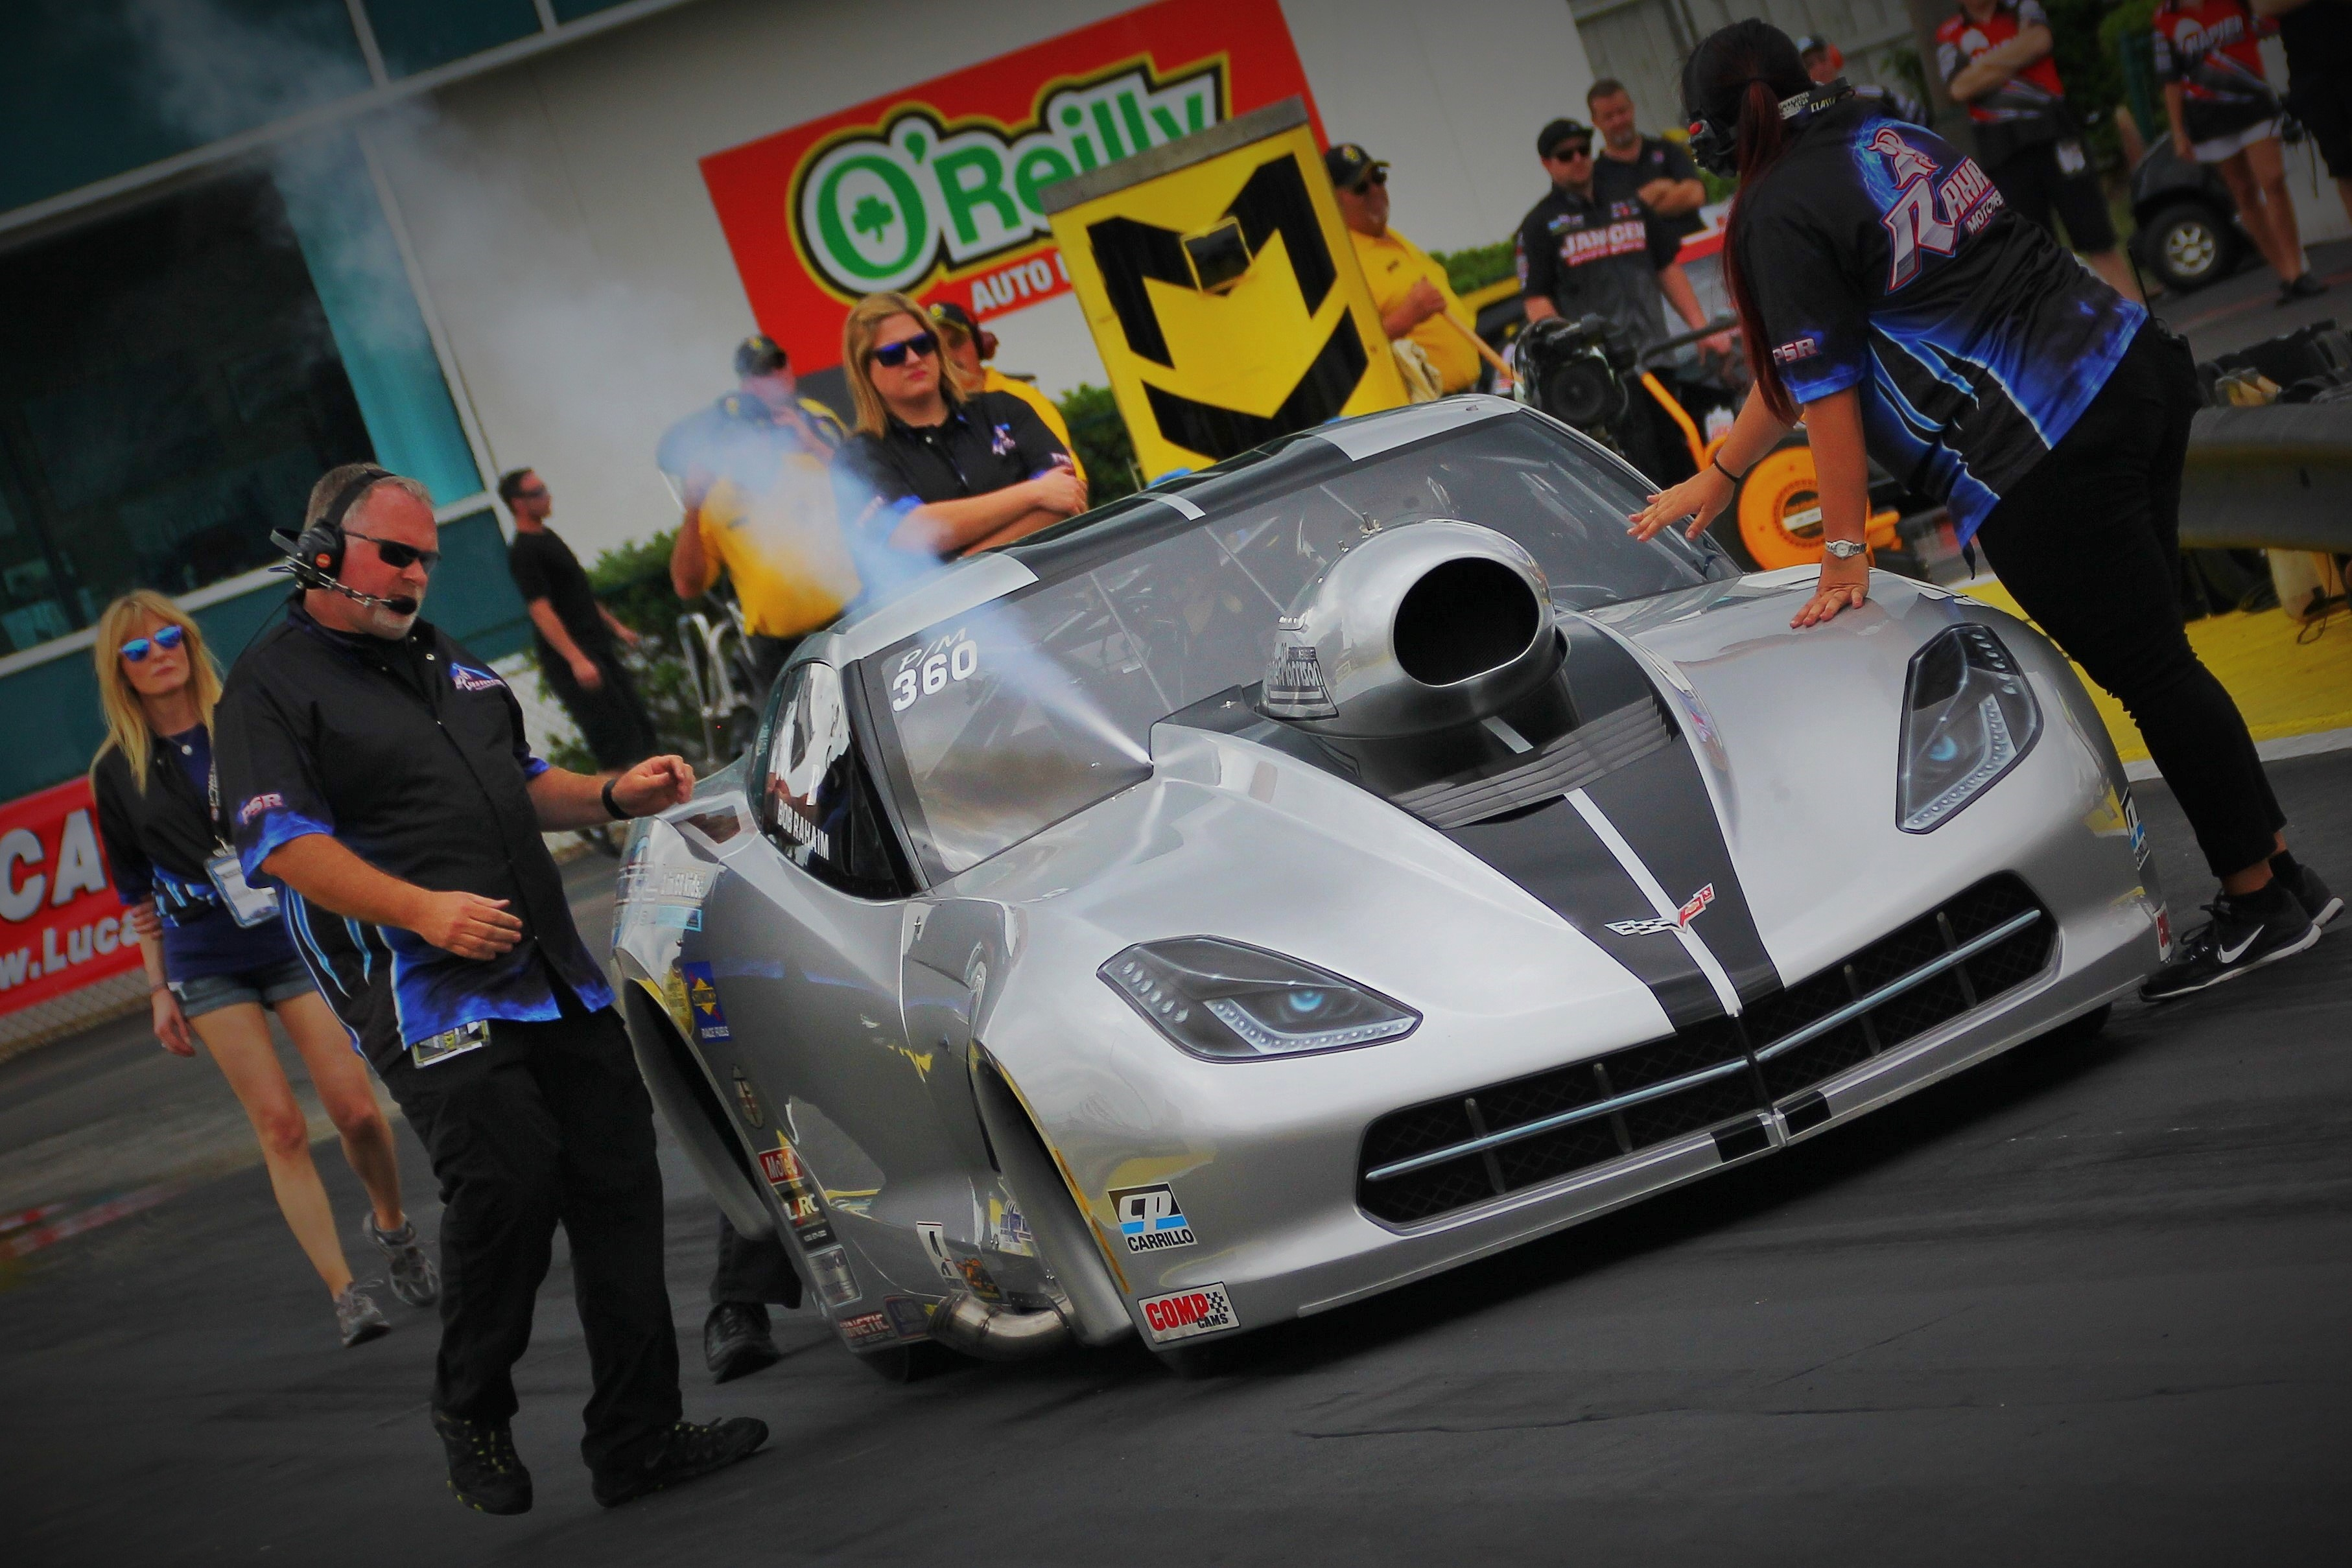 Gallery of Gatornationals – RacingJunk News